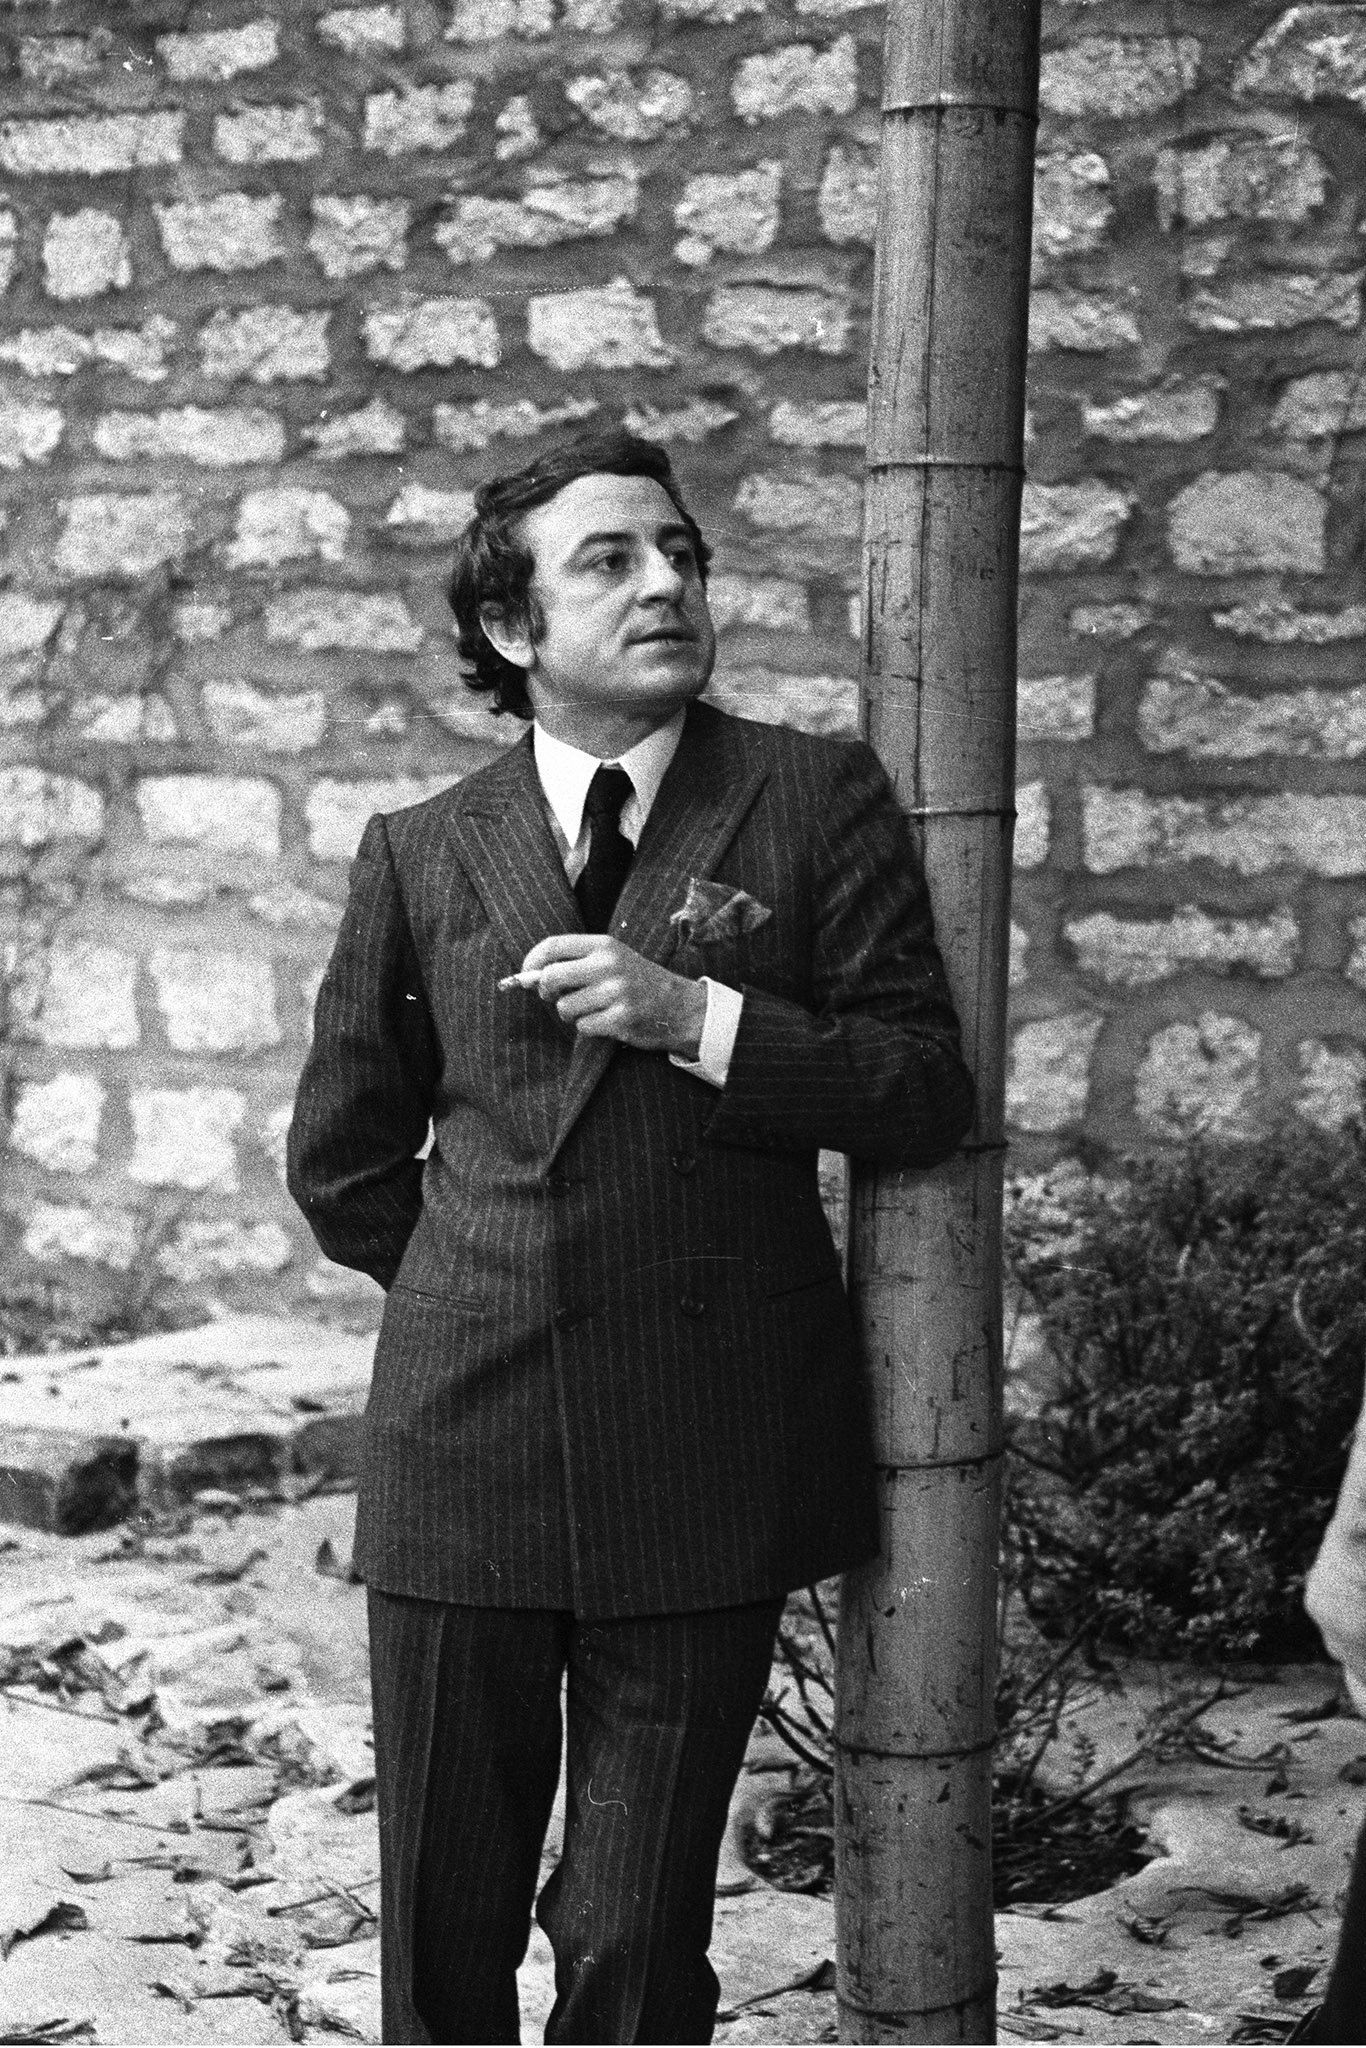 Pierre BergŽ  talking in the garden of Yves Saint Laurent's Paris home.